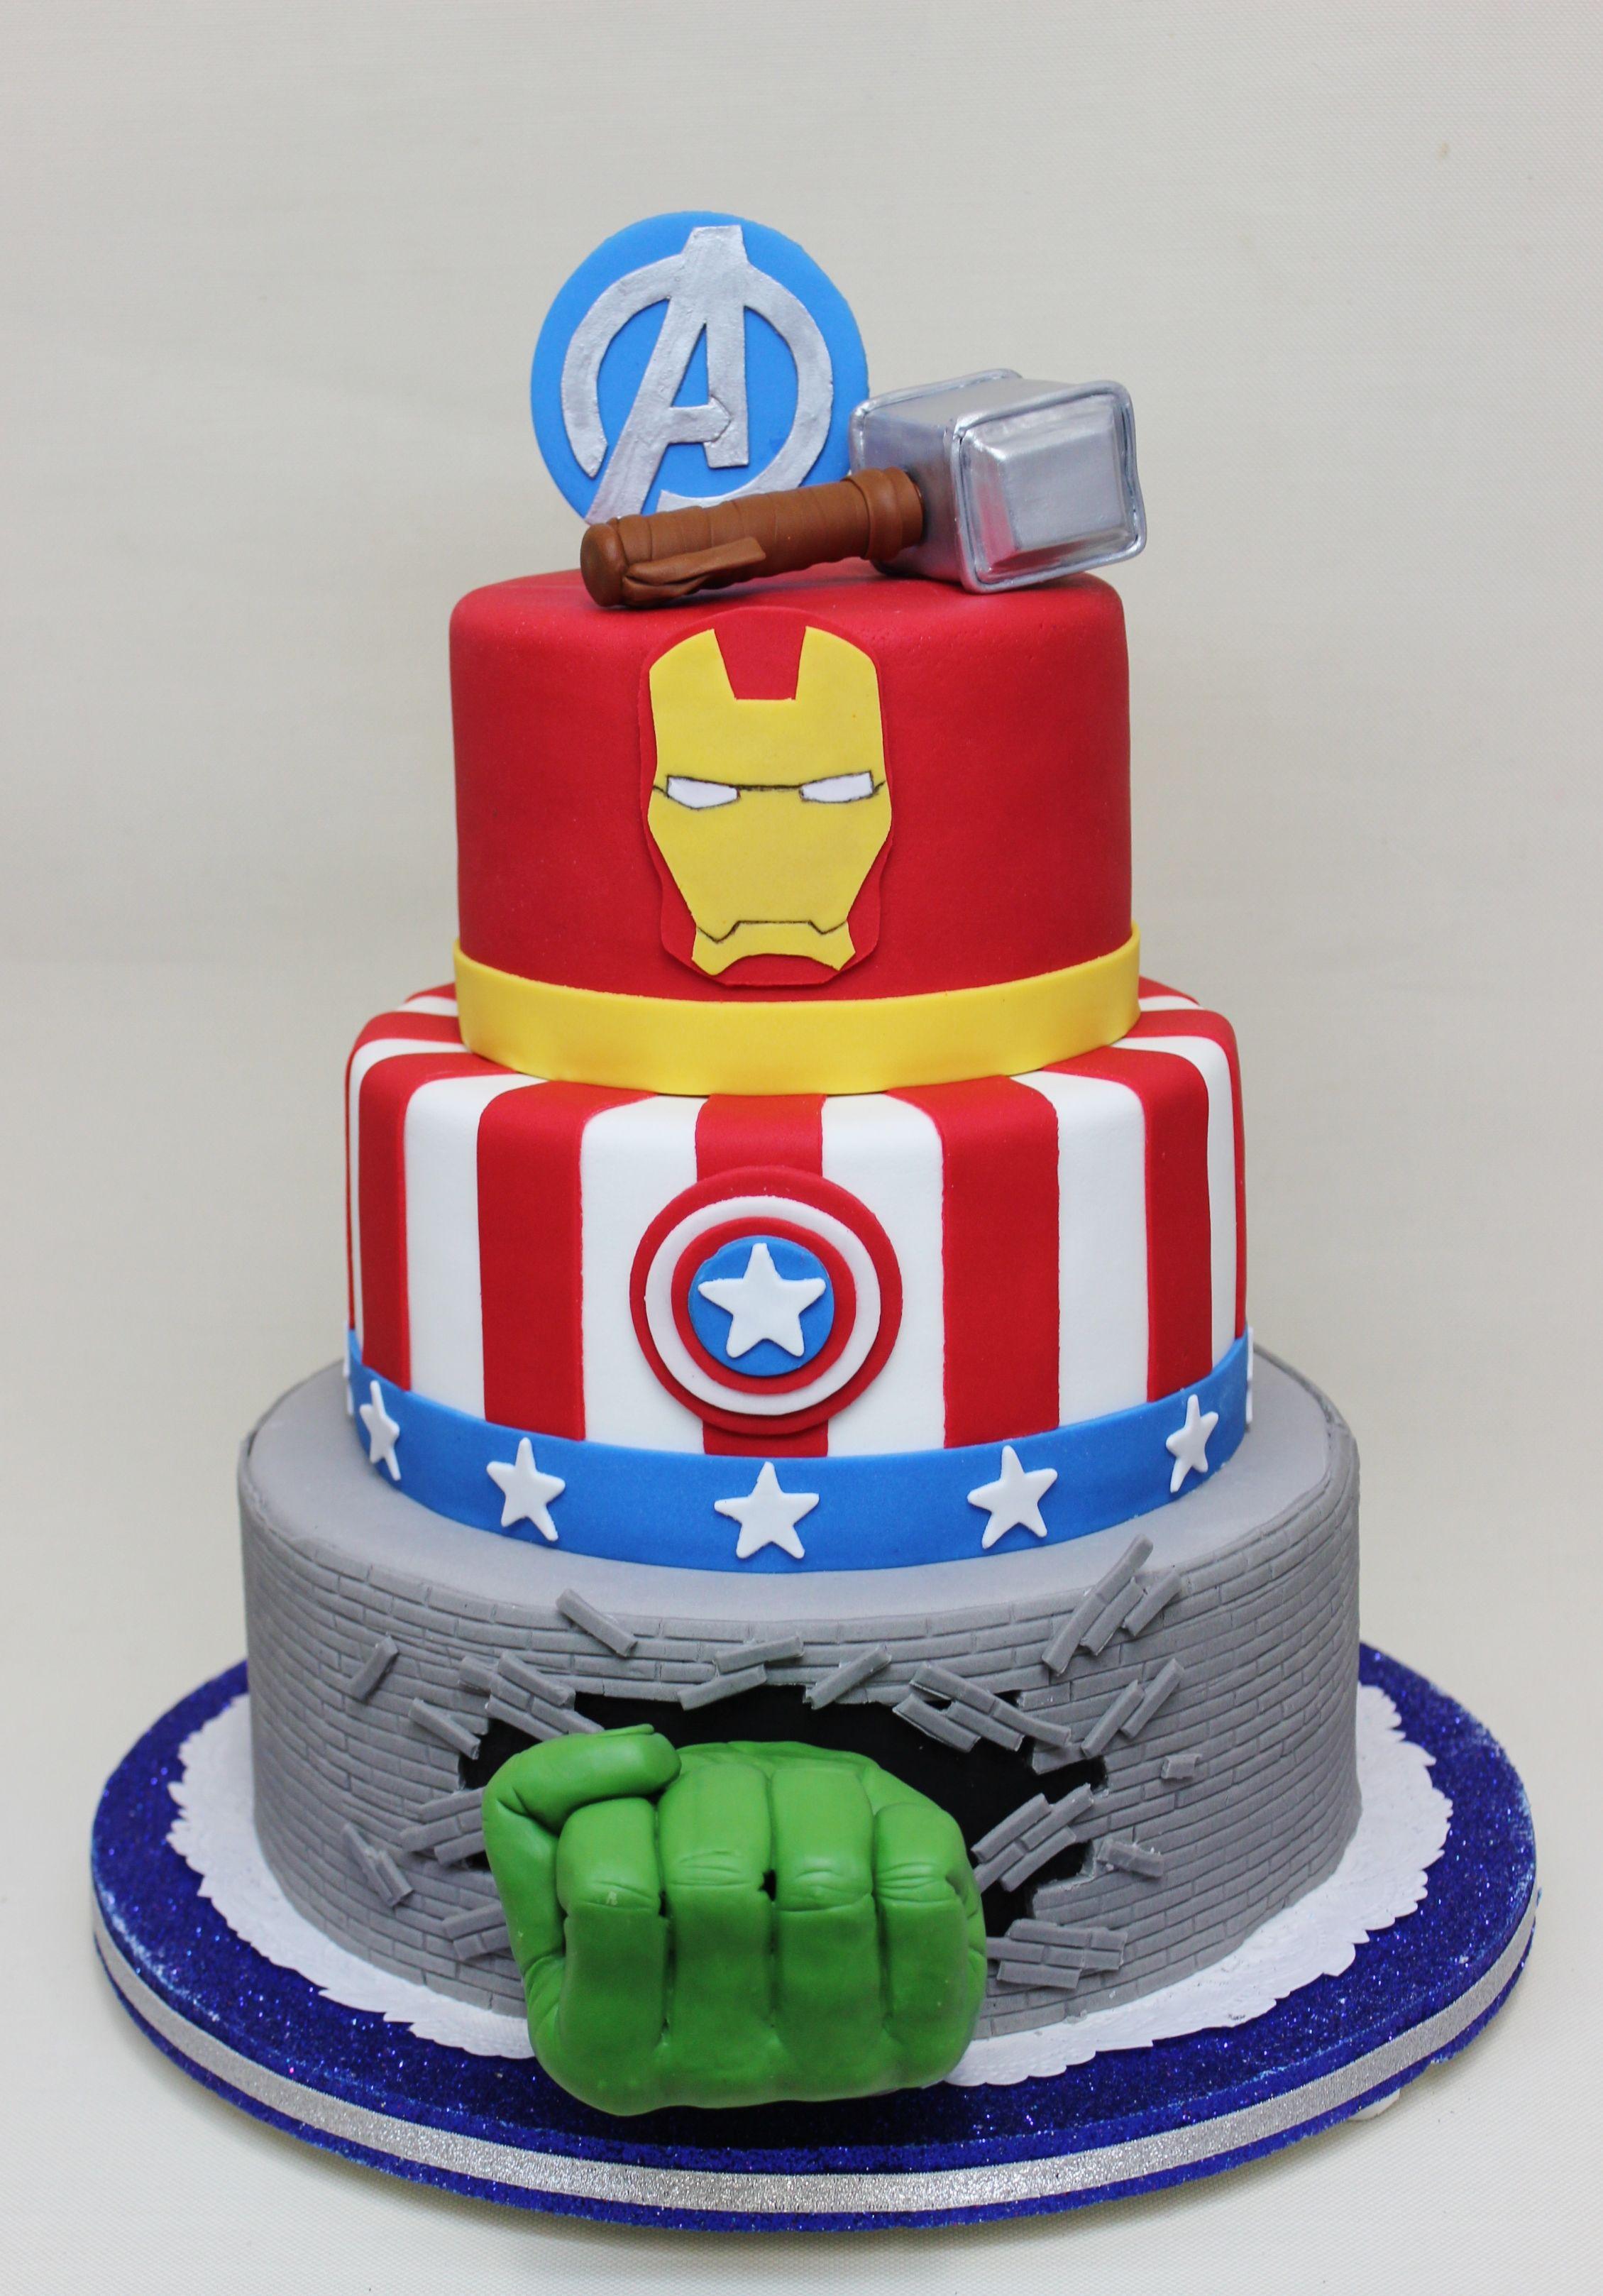 Avengers Cake Decorations